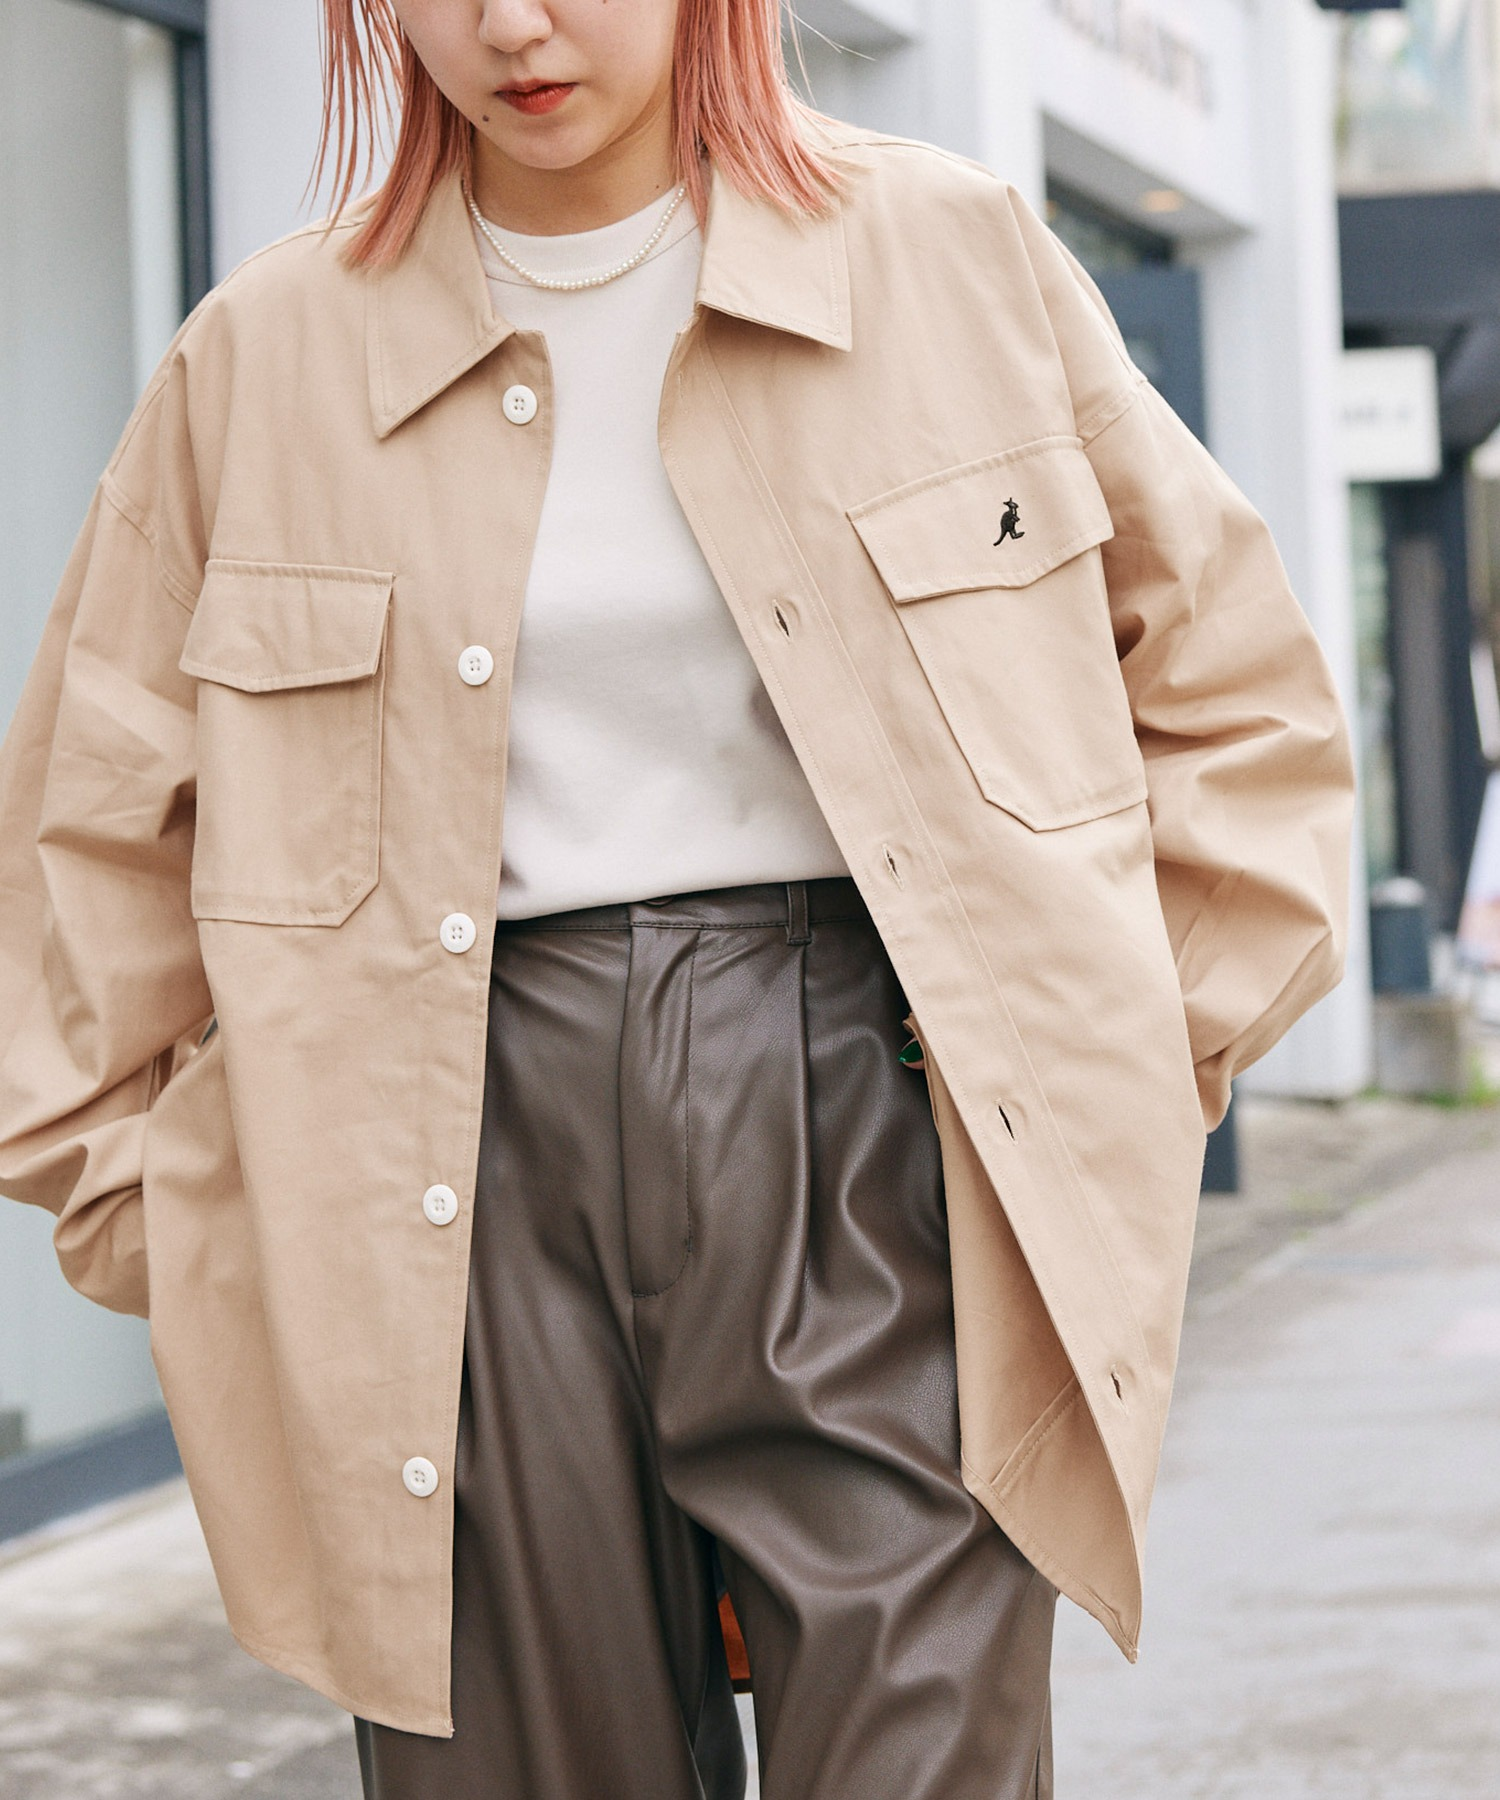 KANGOL/カンゴール 別注 オーバーサイズ ツイル CPO シャツ シャツジャケット/2020SPRING